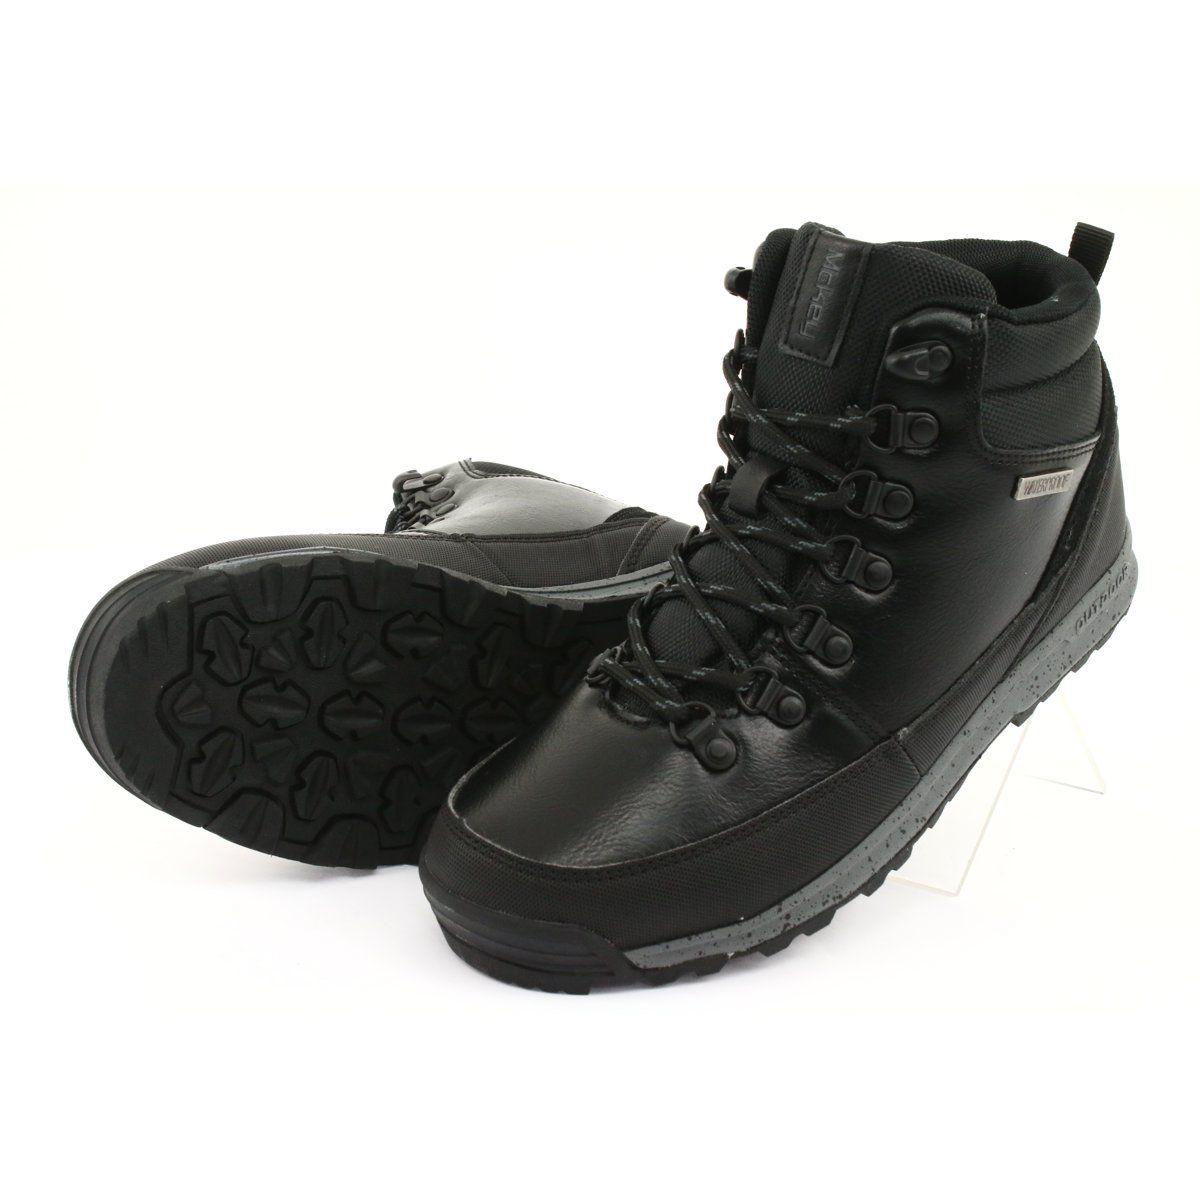 Trekking Women S Mckey Mckey 1066 Trekking Shoes Black Black Shoes Trekking Shoes Boots